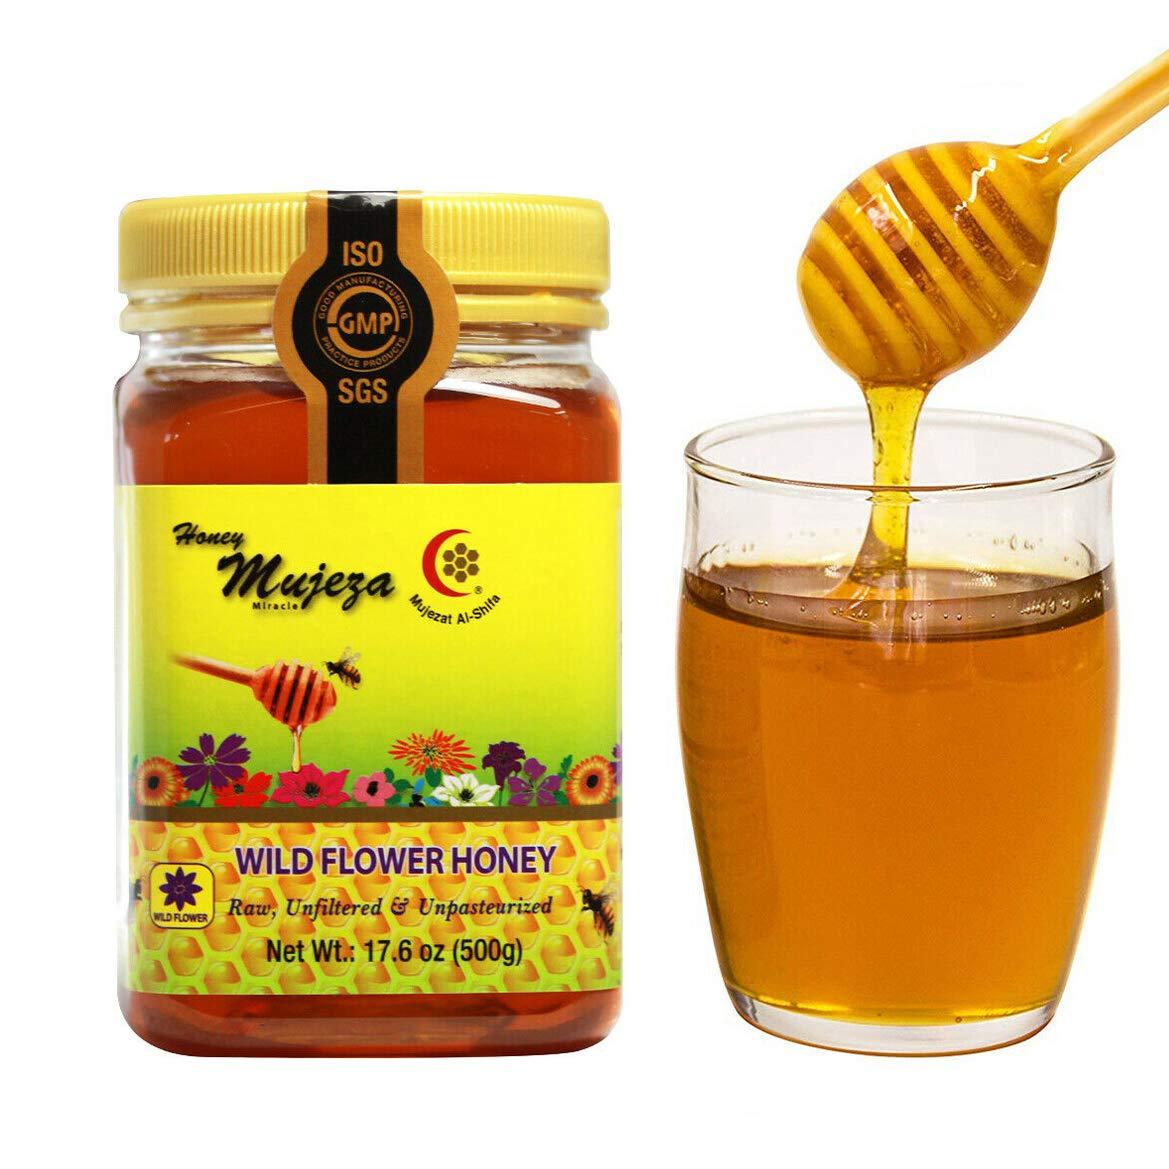 (Wildflower (500g), 1 Jar) Mujeza Wildflower Honey, Unheated, Unfiltered, Unpasteurized 100% Natural Raw Honey, Non GMO